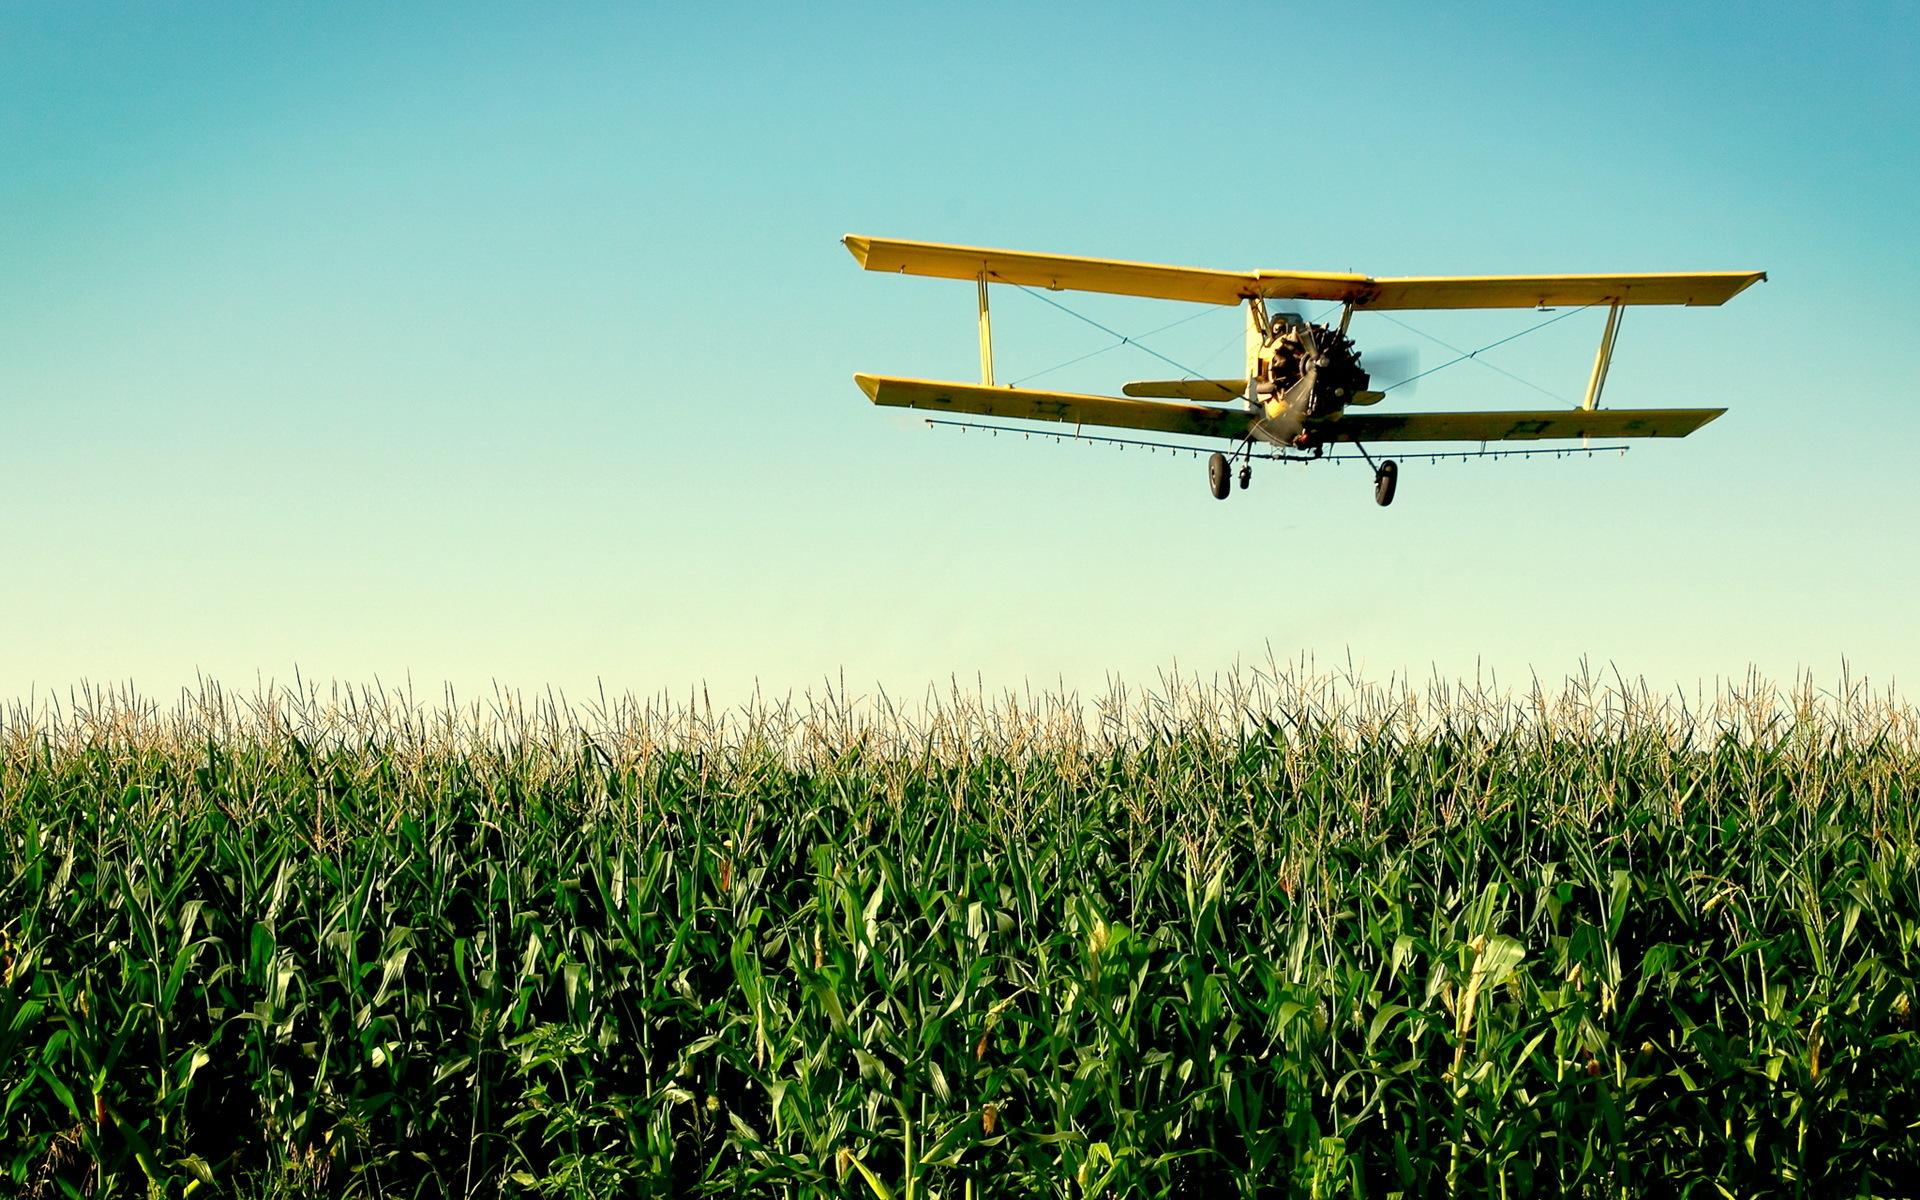 Biplane Cornfield